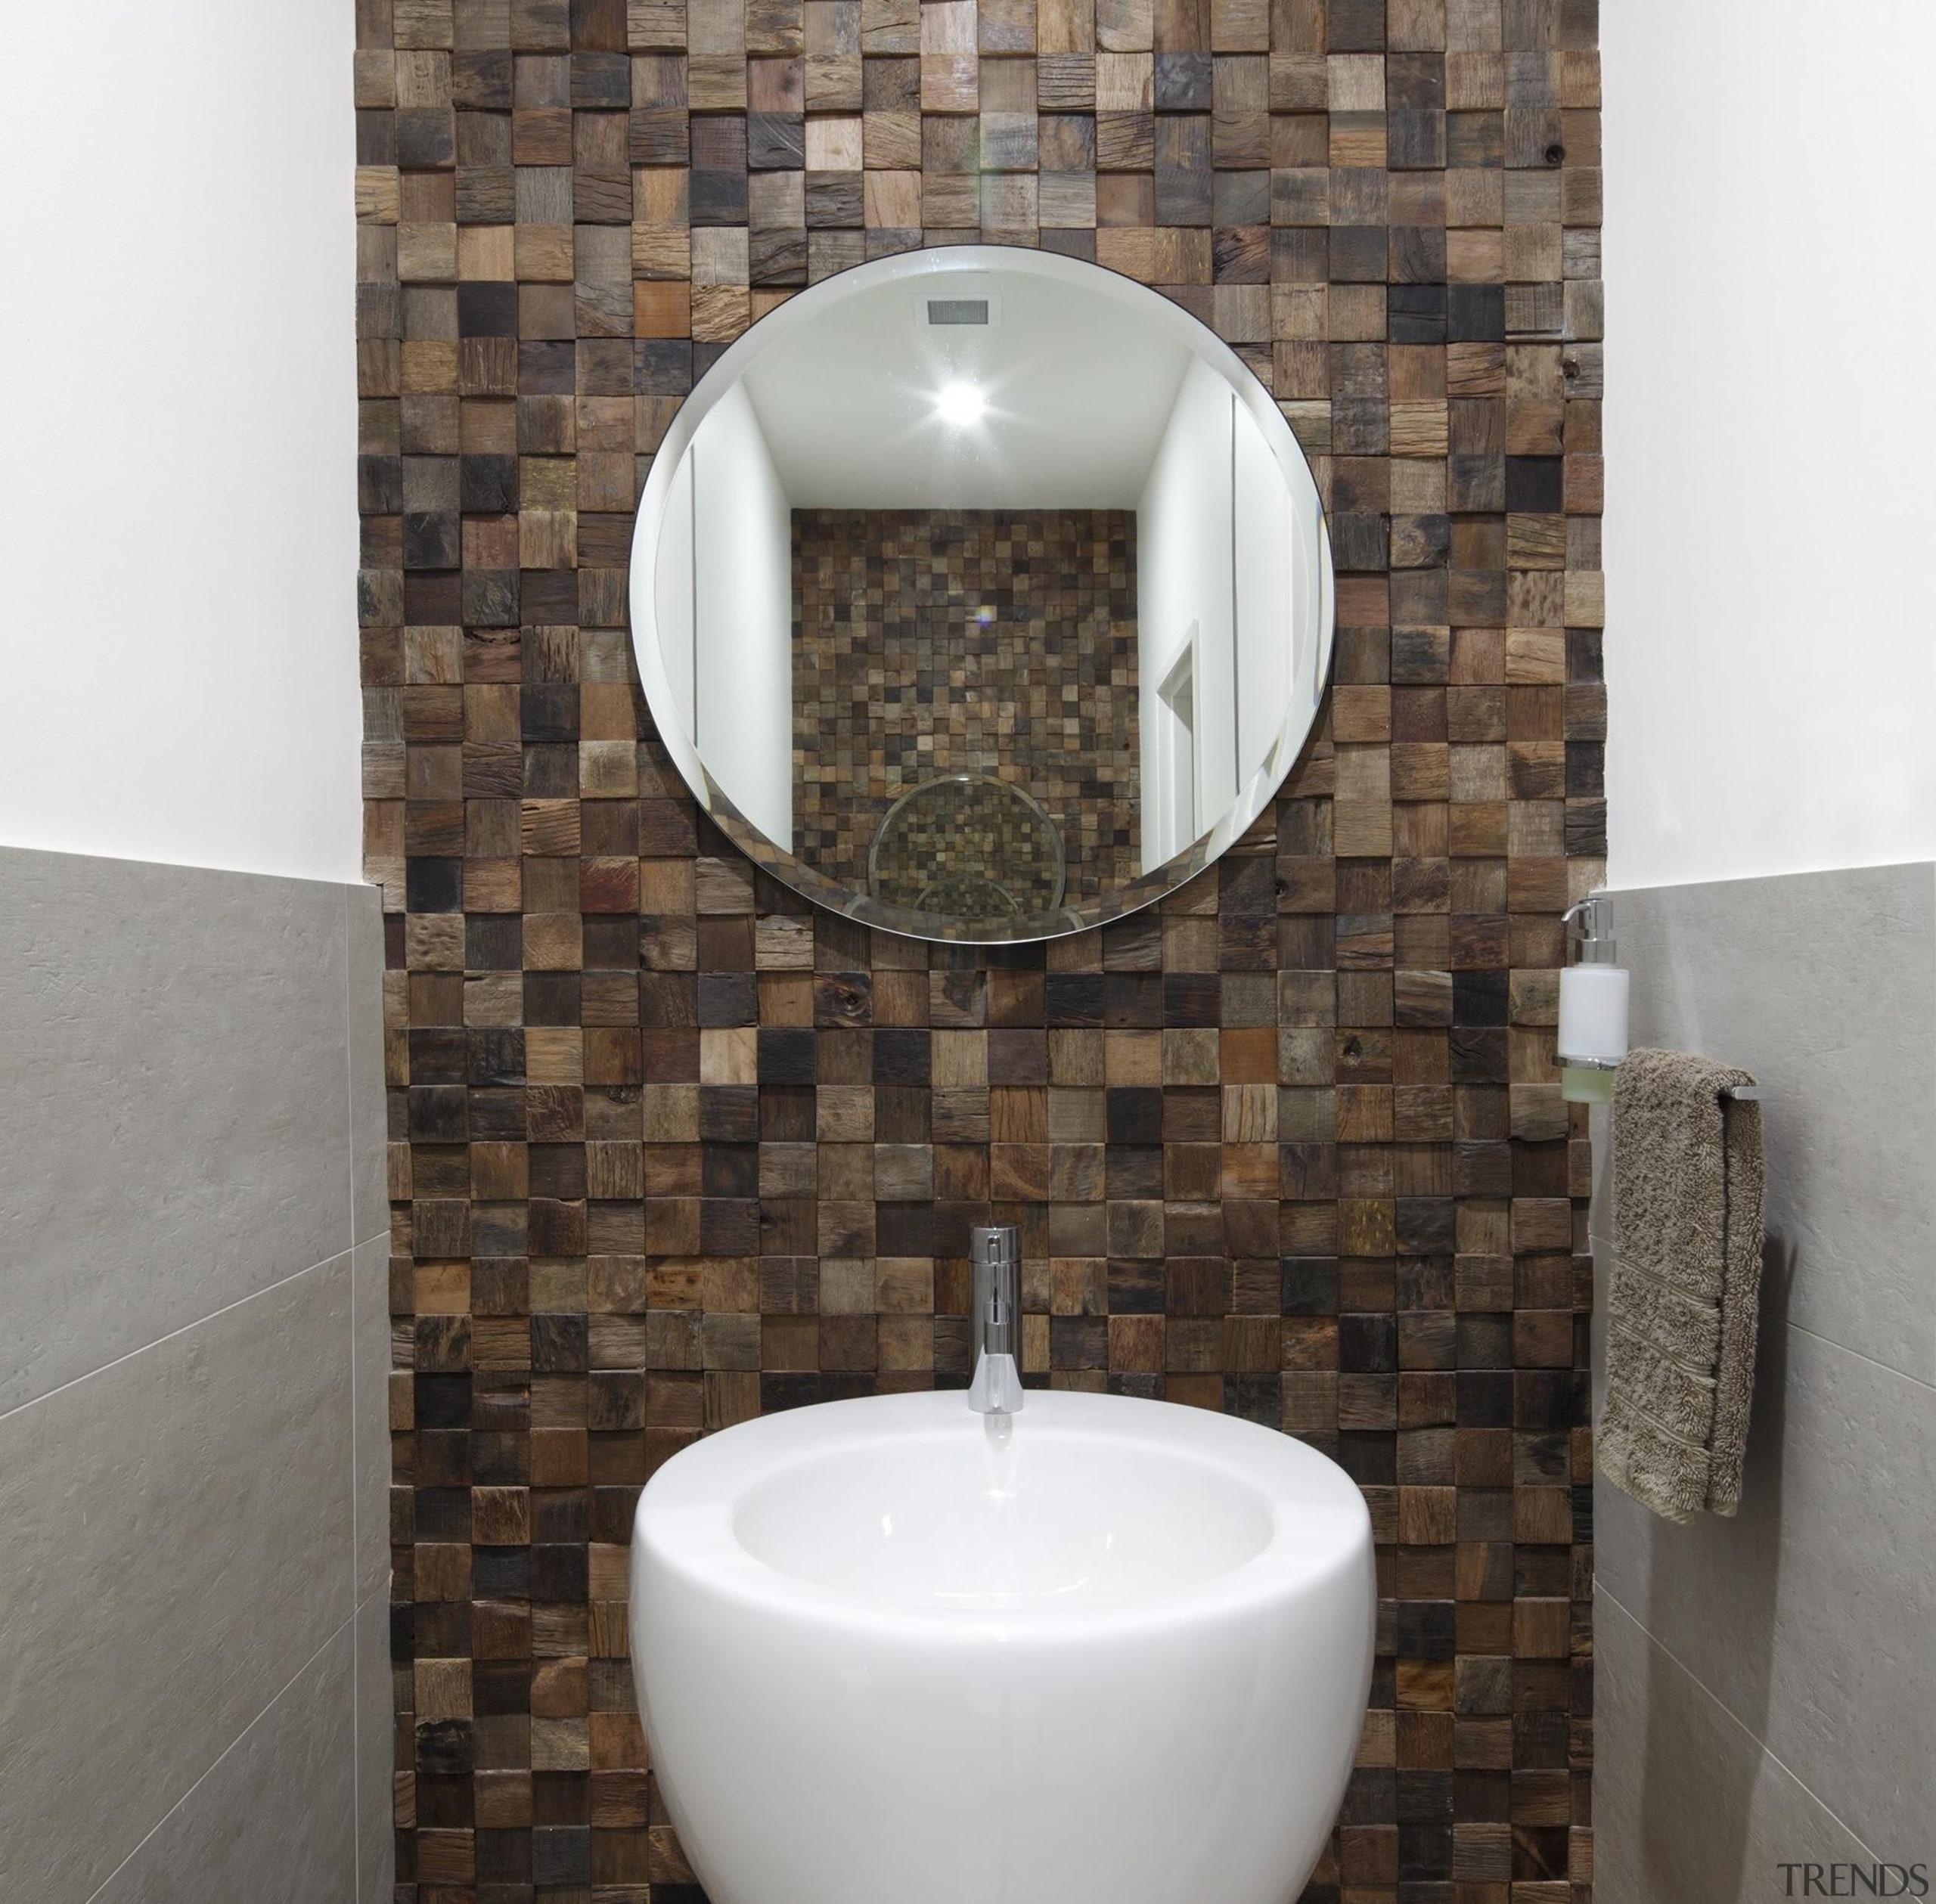 Brindabella Bathrooms - Winner of HIA Bathroom Design bathroom, ceramic, floor, plumbing fixture, sink, tap, tile, toilet, toilet seat, wall, gray, white, black